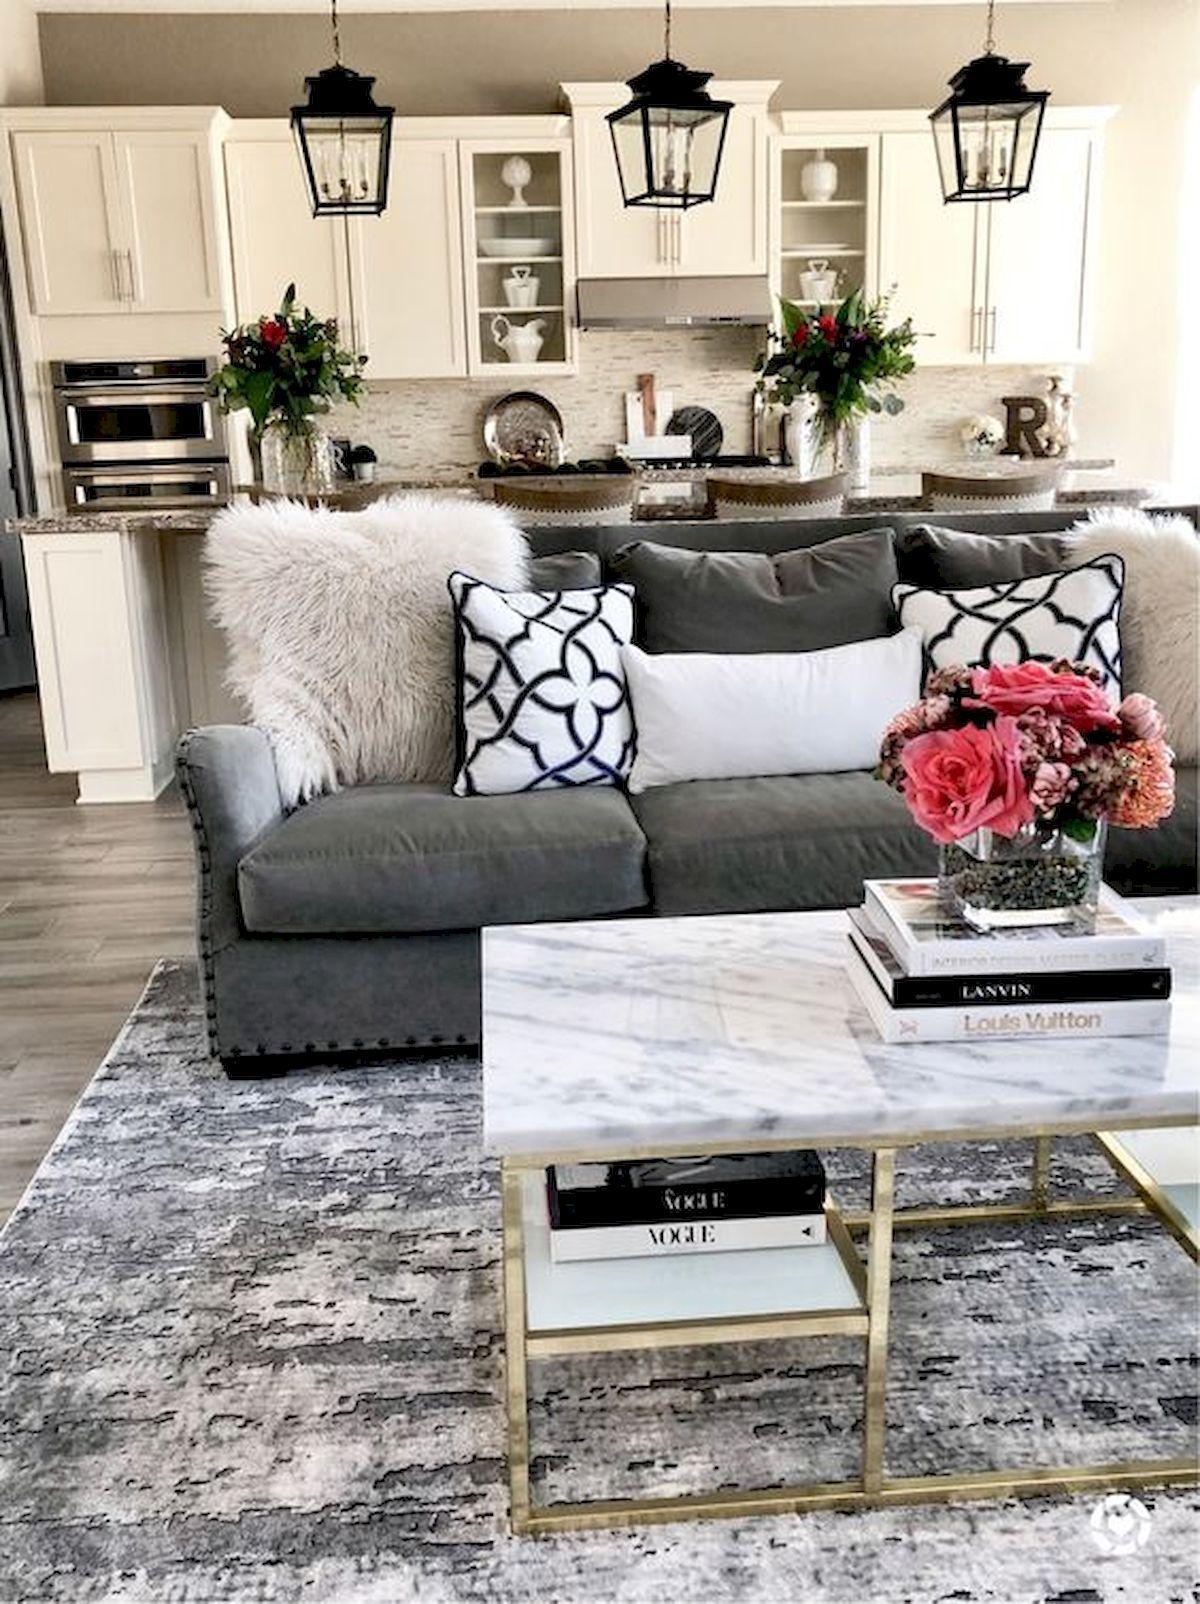 33 Inspiring Modern Farmhouse Rugs Decor Ideas And Design33decor Living Room Sofa Design Farm House Living Room Living Room Grey